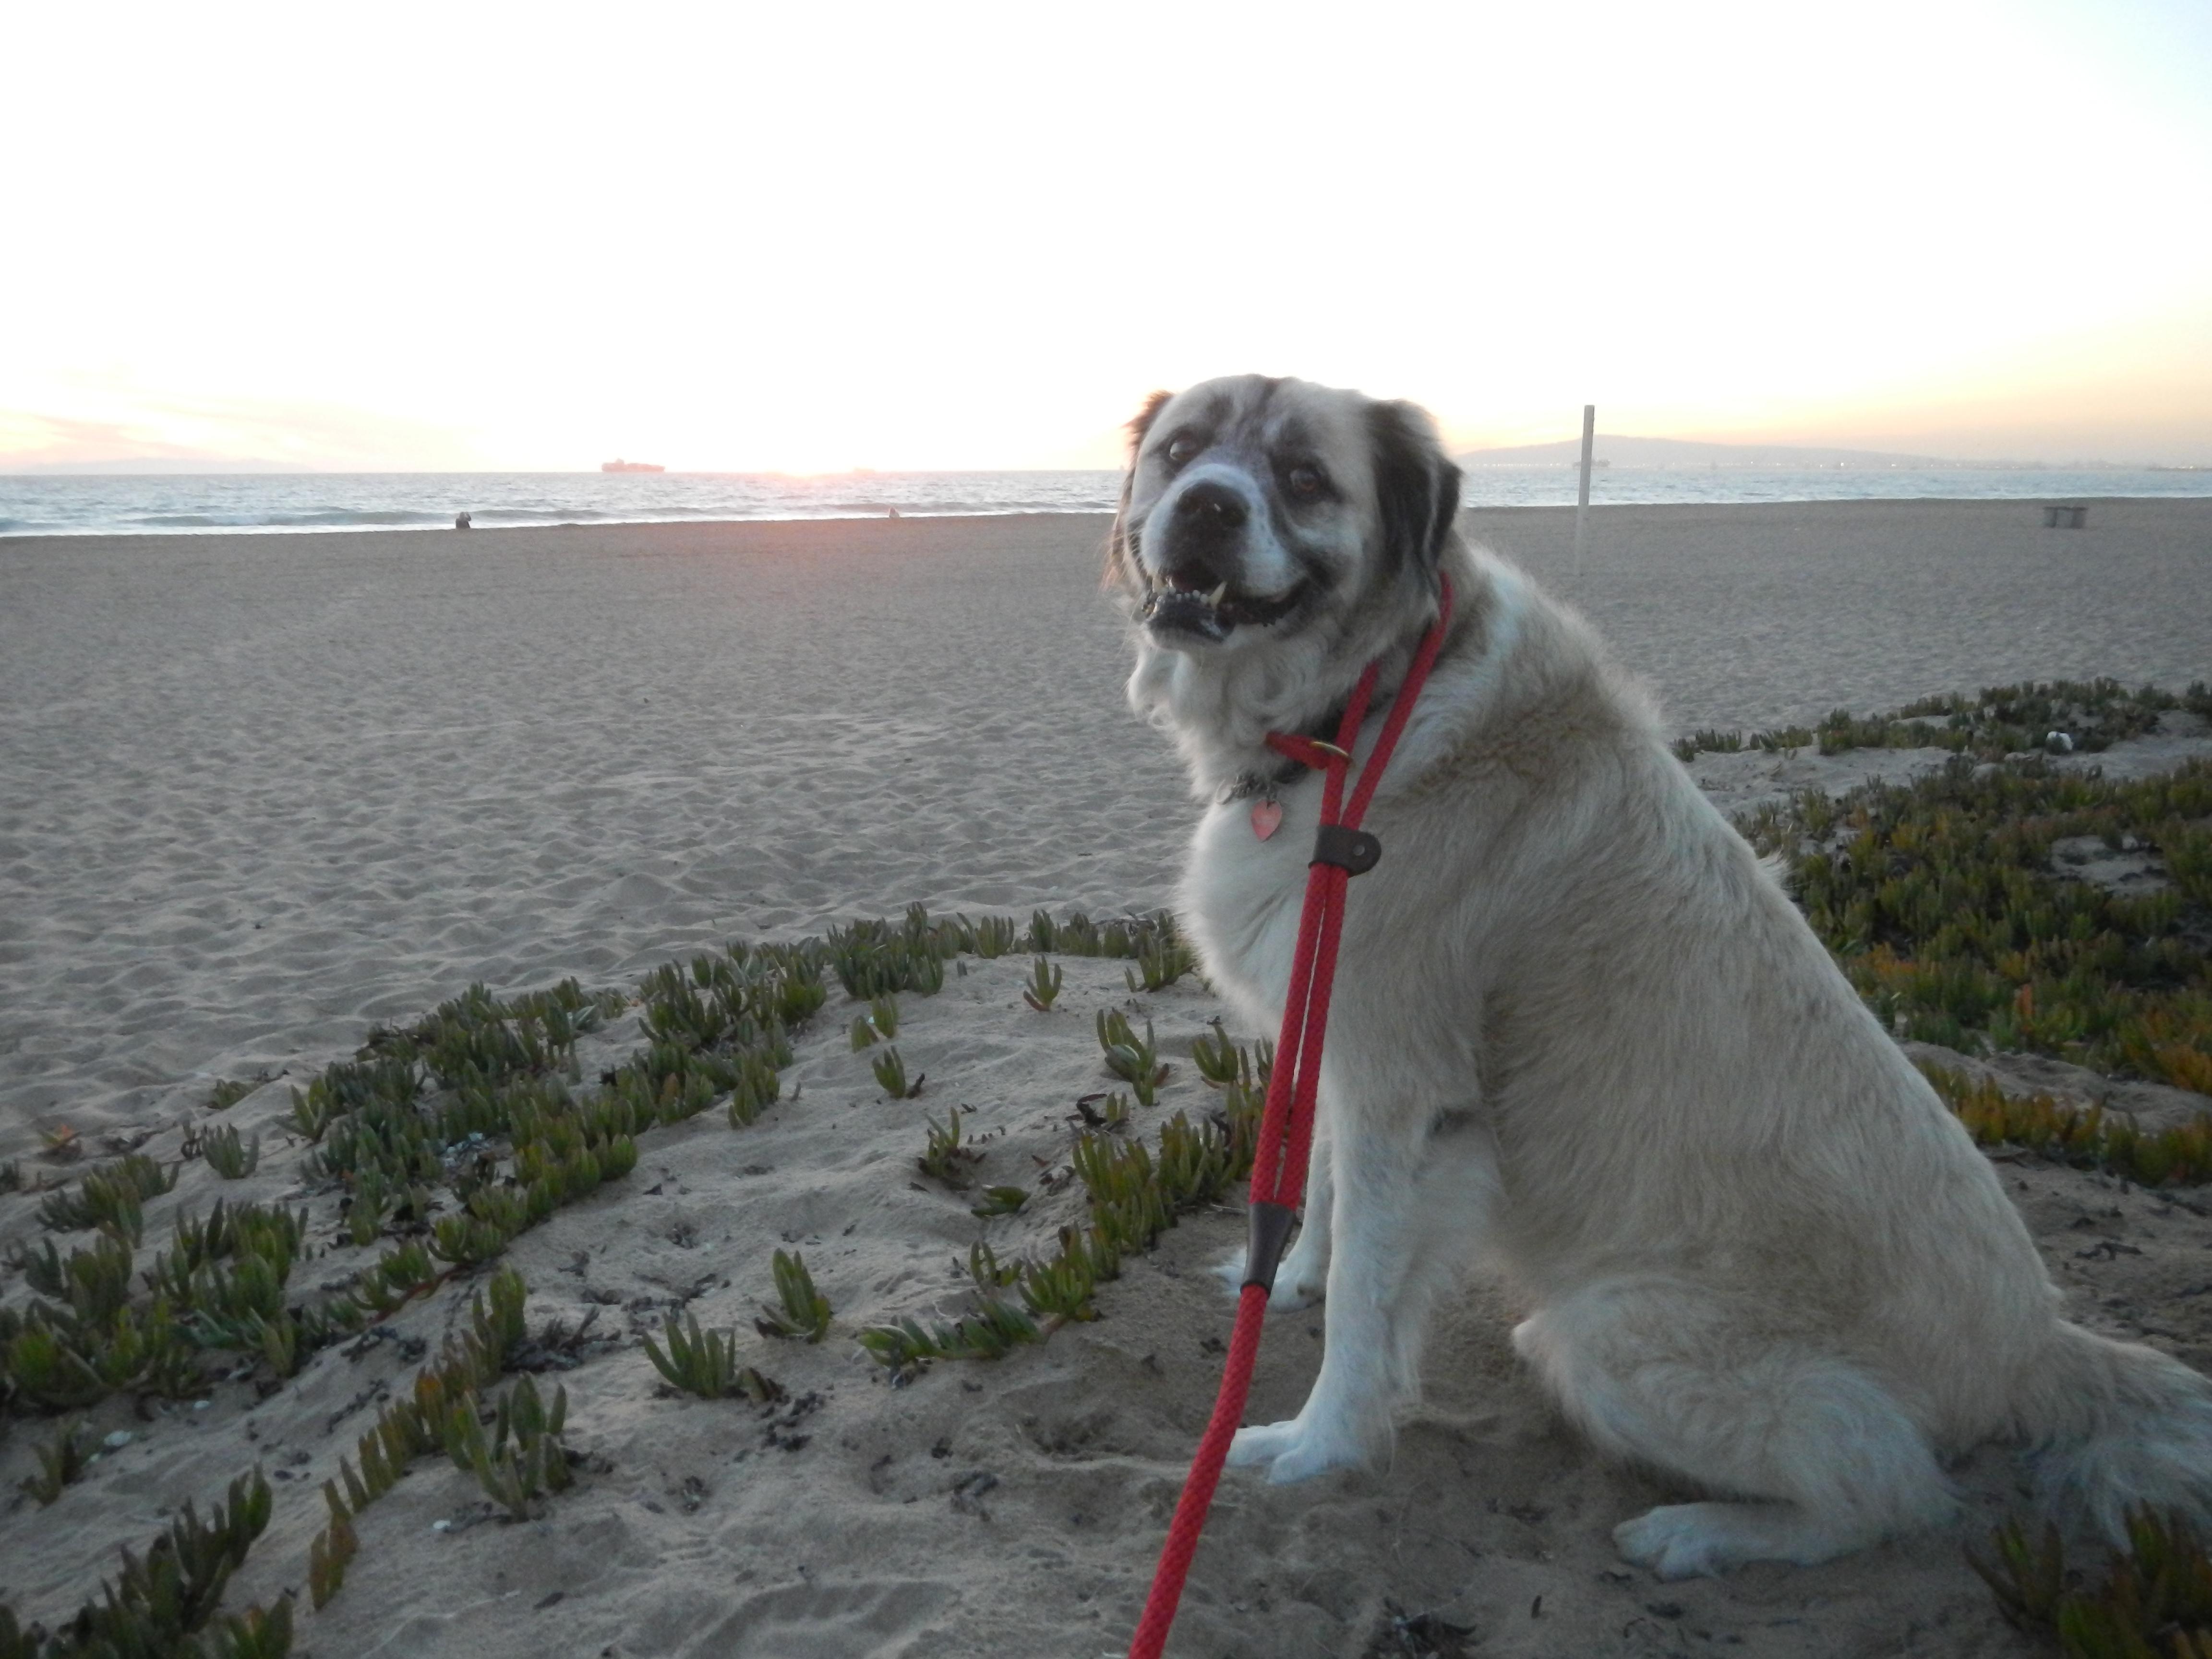 Herman: Hey, look the sun is setting!